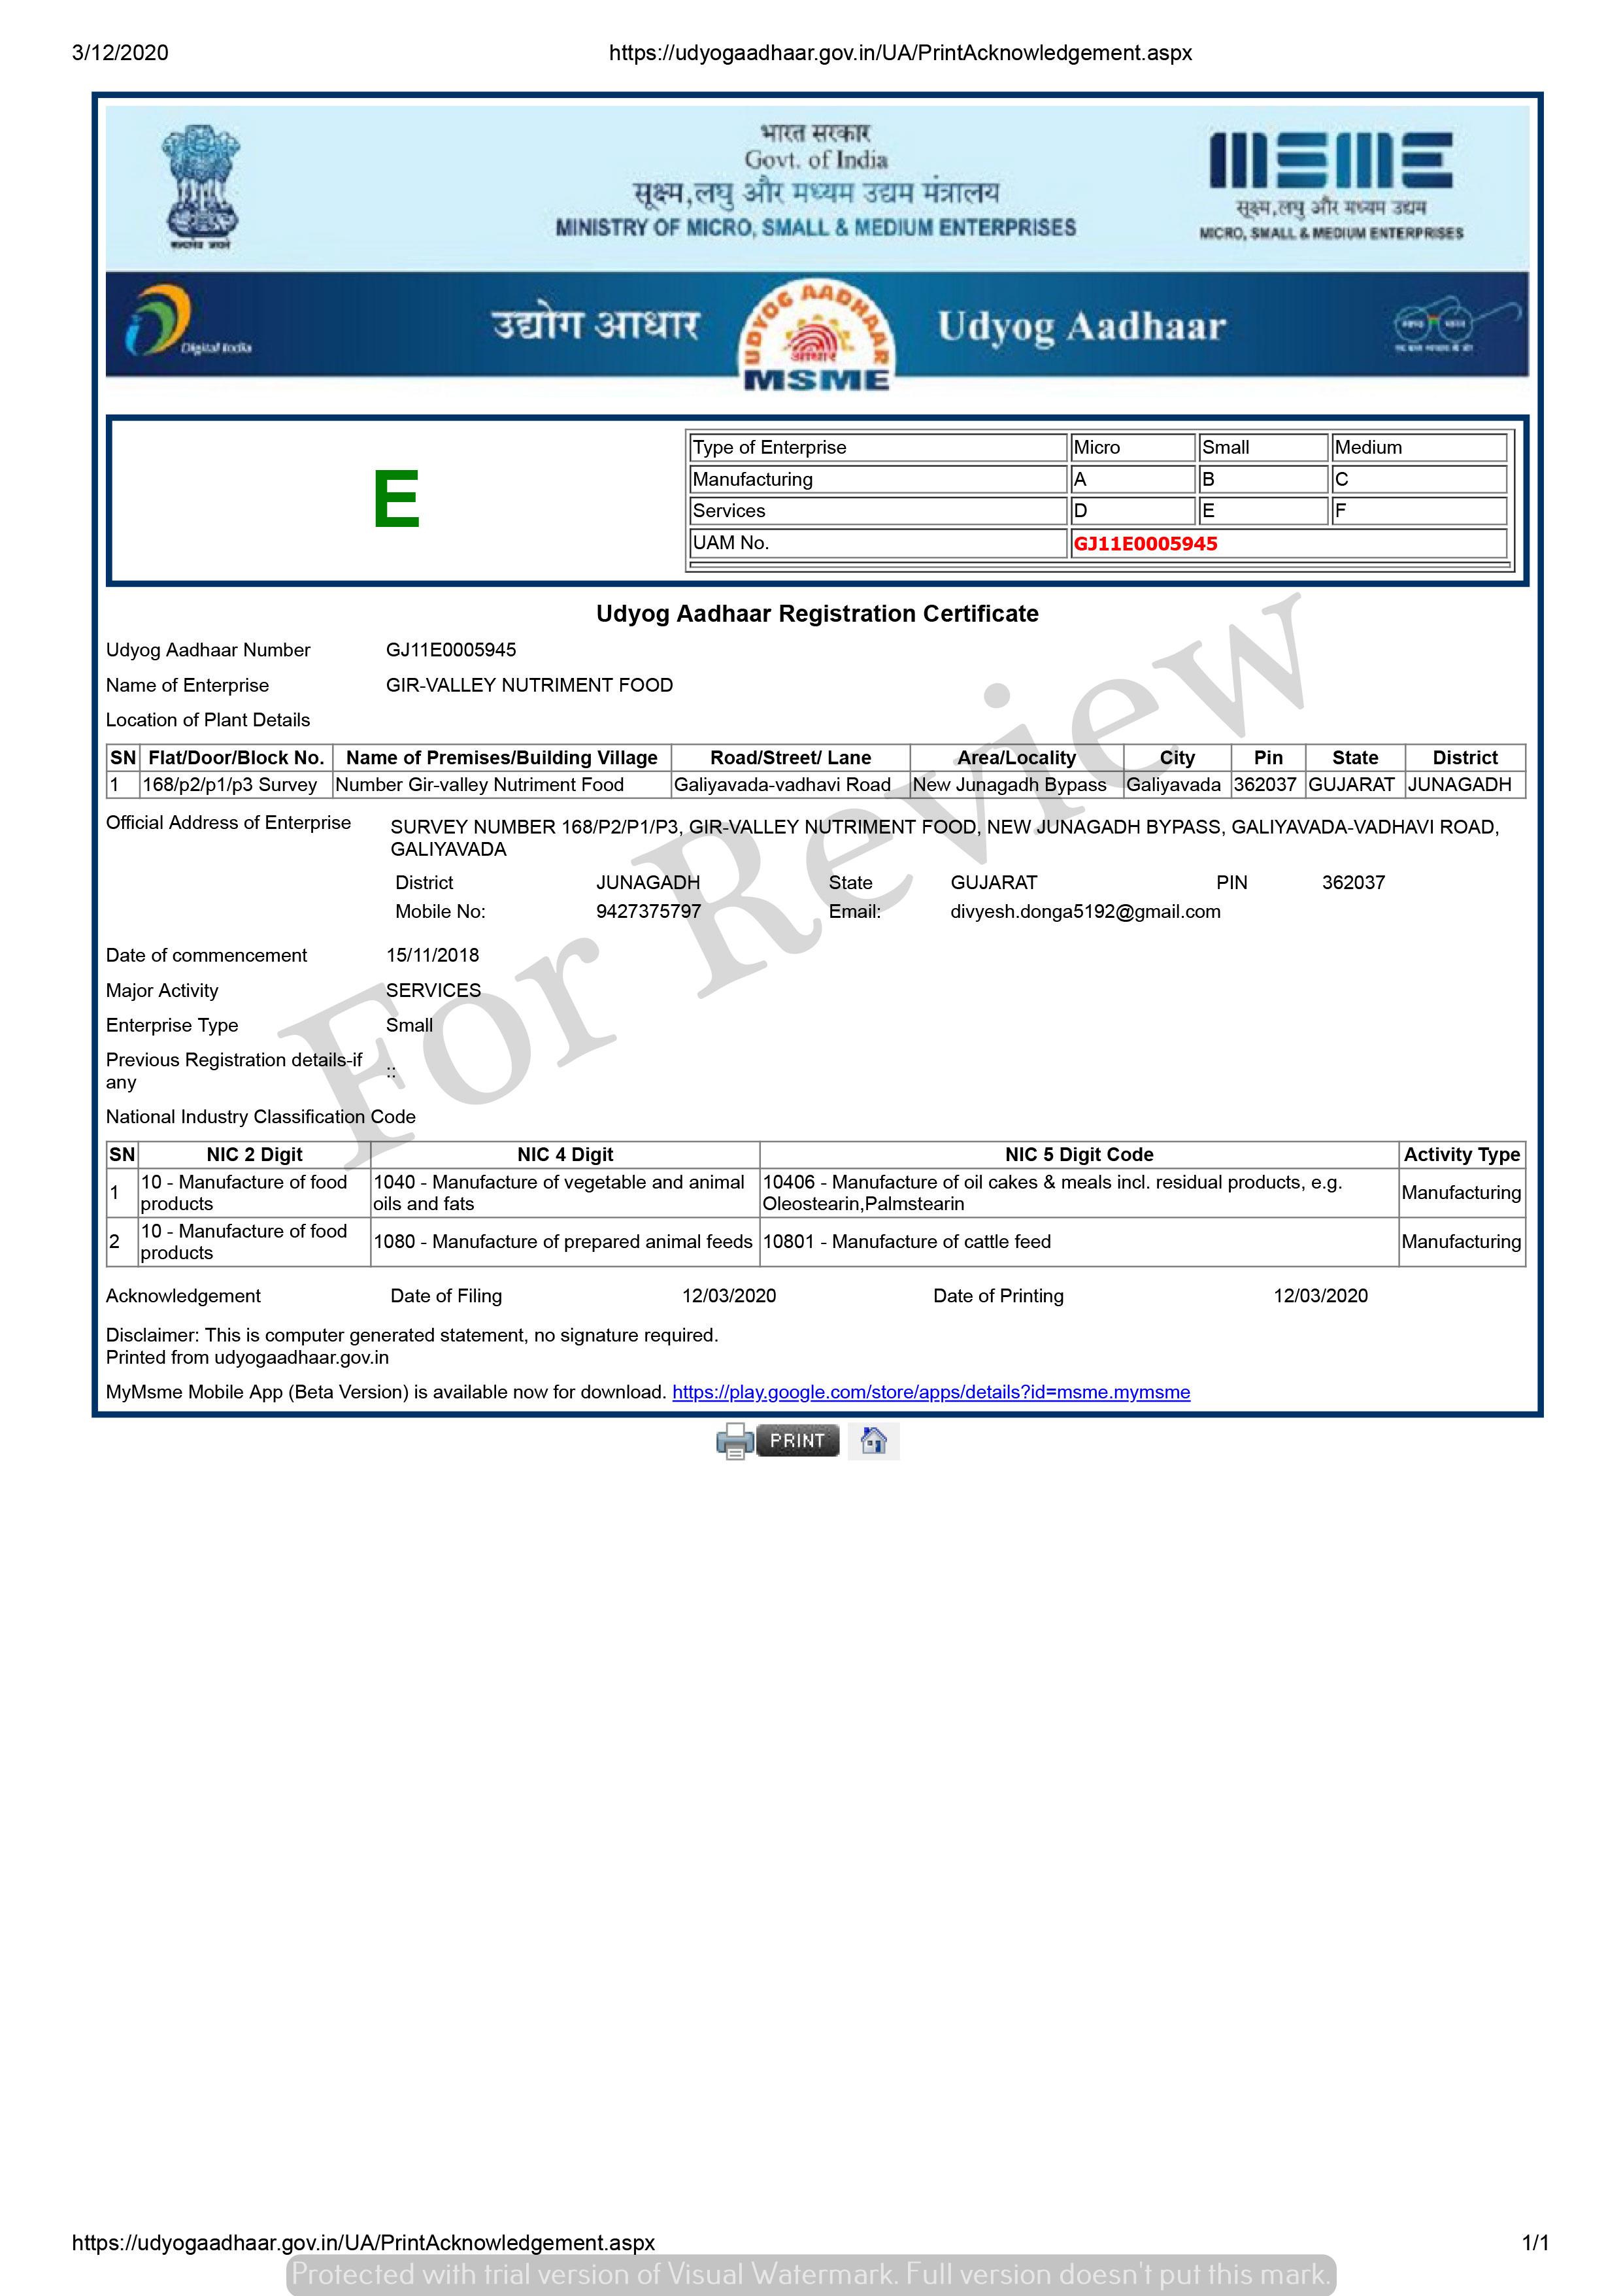 Udhyog Aadhar Certificates